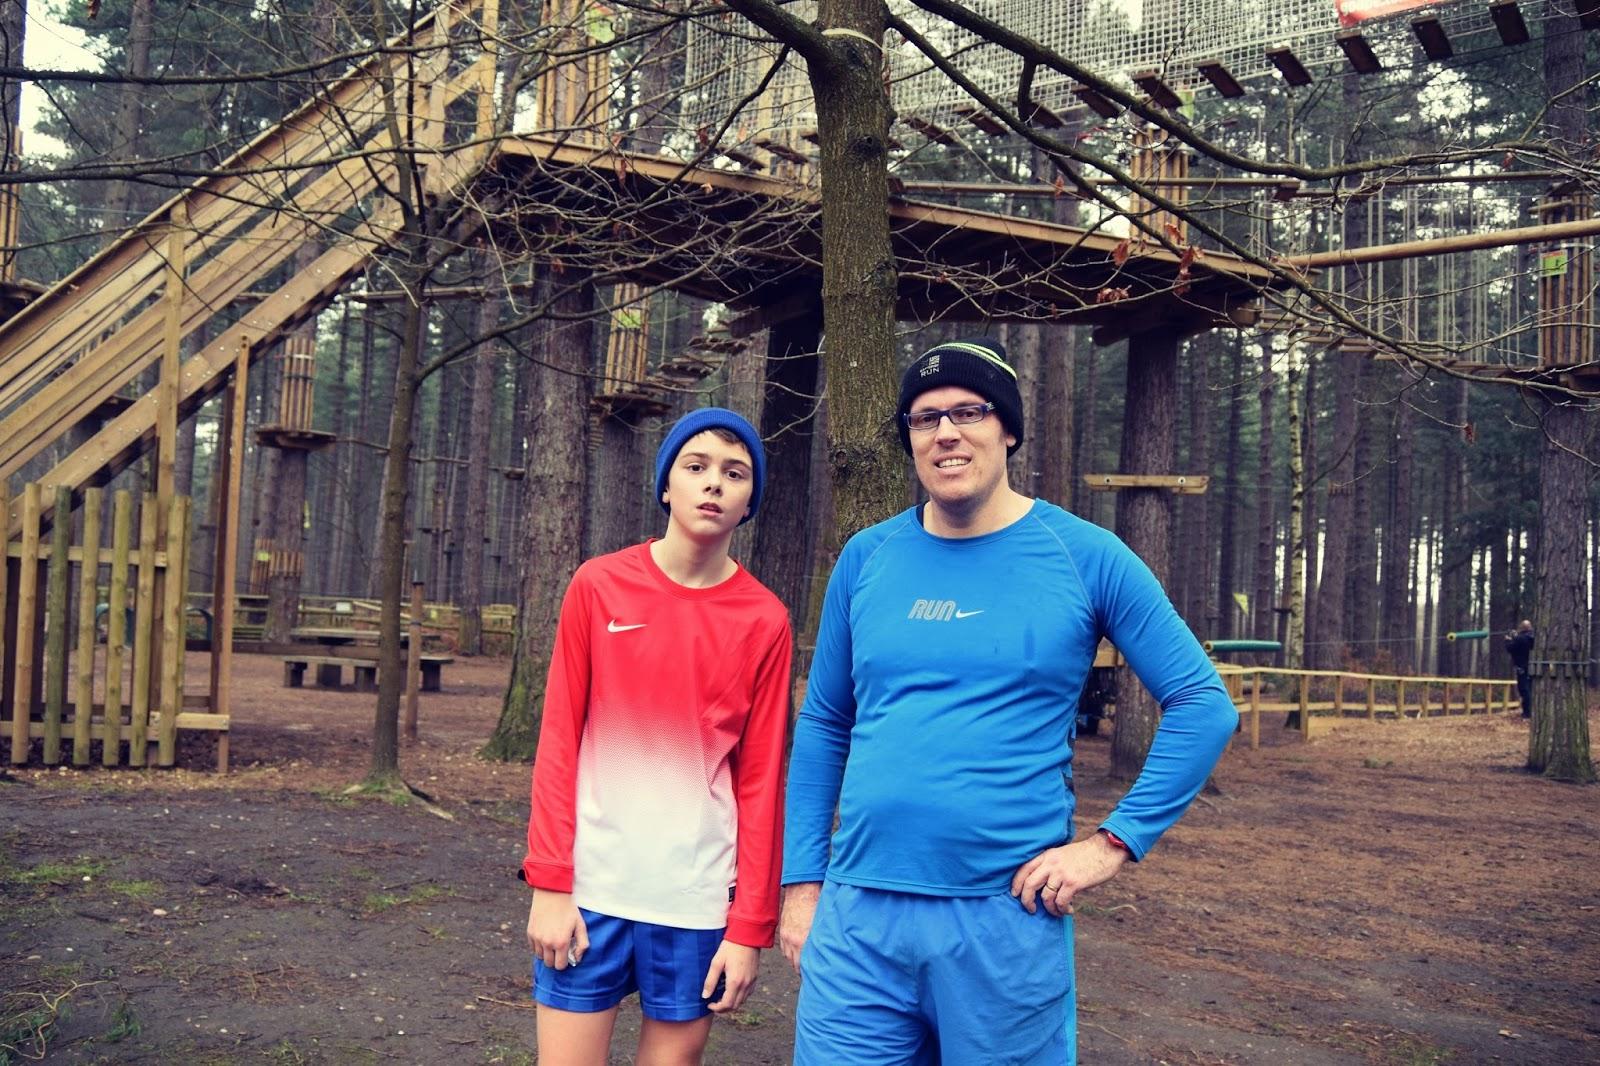 Sherwood Pines Parkrun: Saturday Morning Run & Fun.